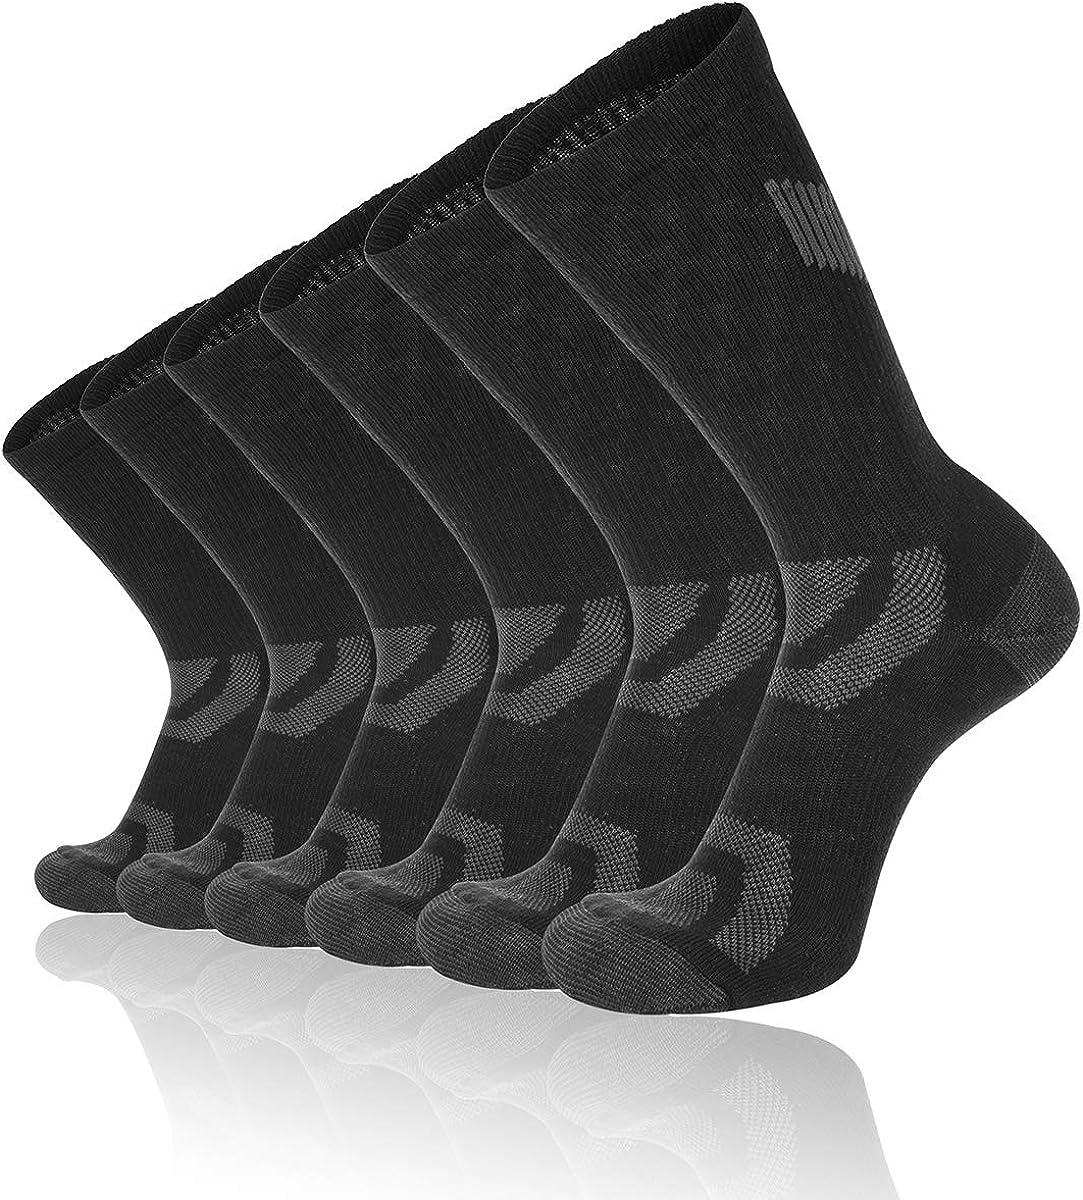 Eallco Mens 6 Pack Athletic Crew Socks Performance Cushioned Breathable Sports Work Socks